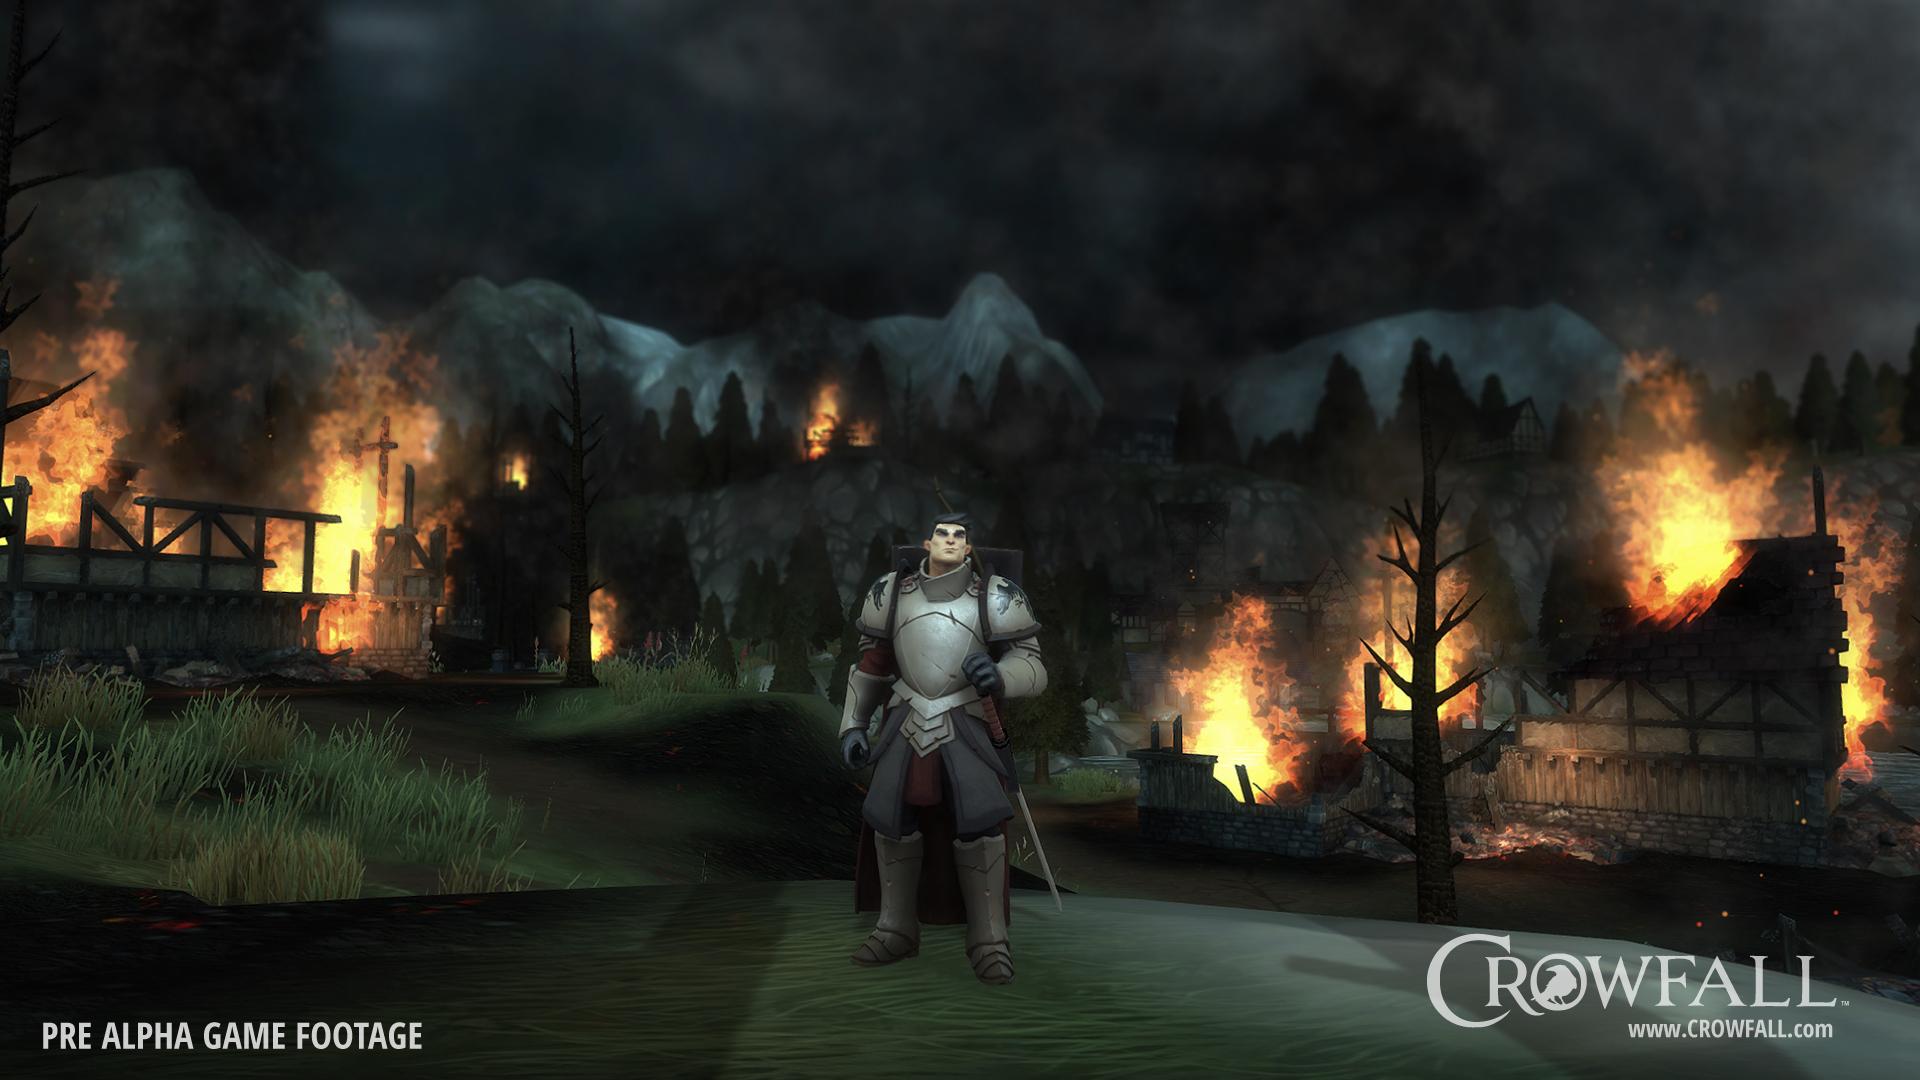 Crowfall Reaches Crowdfunding Goal in Three Days - VR World